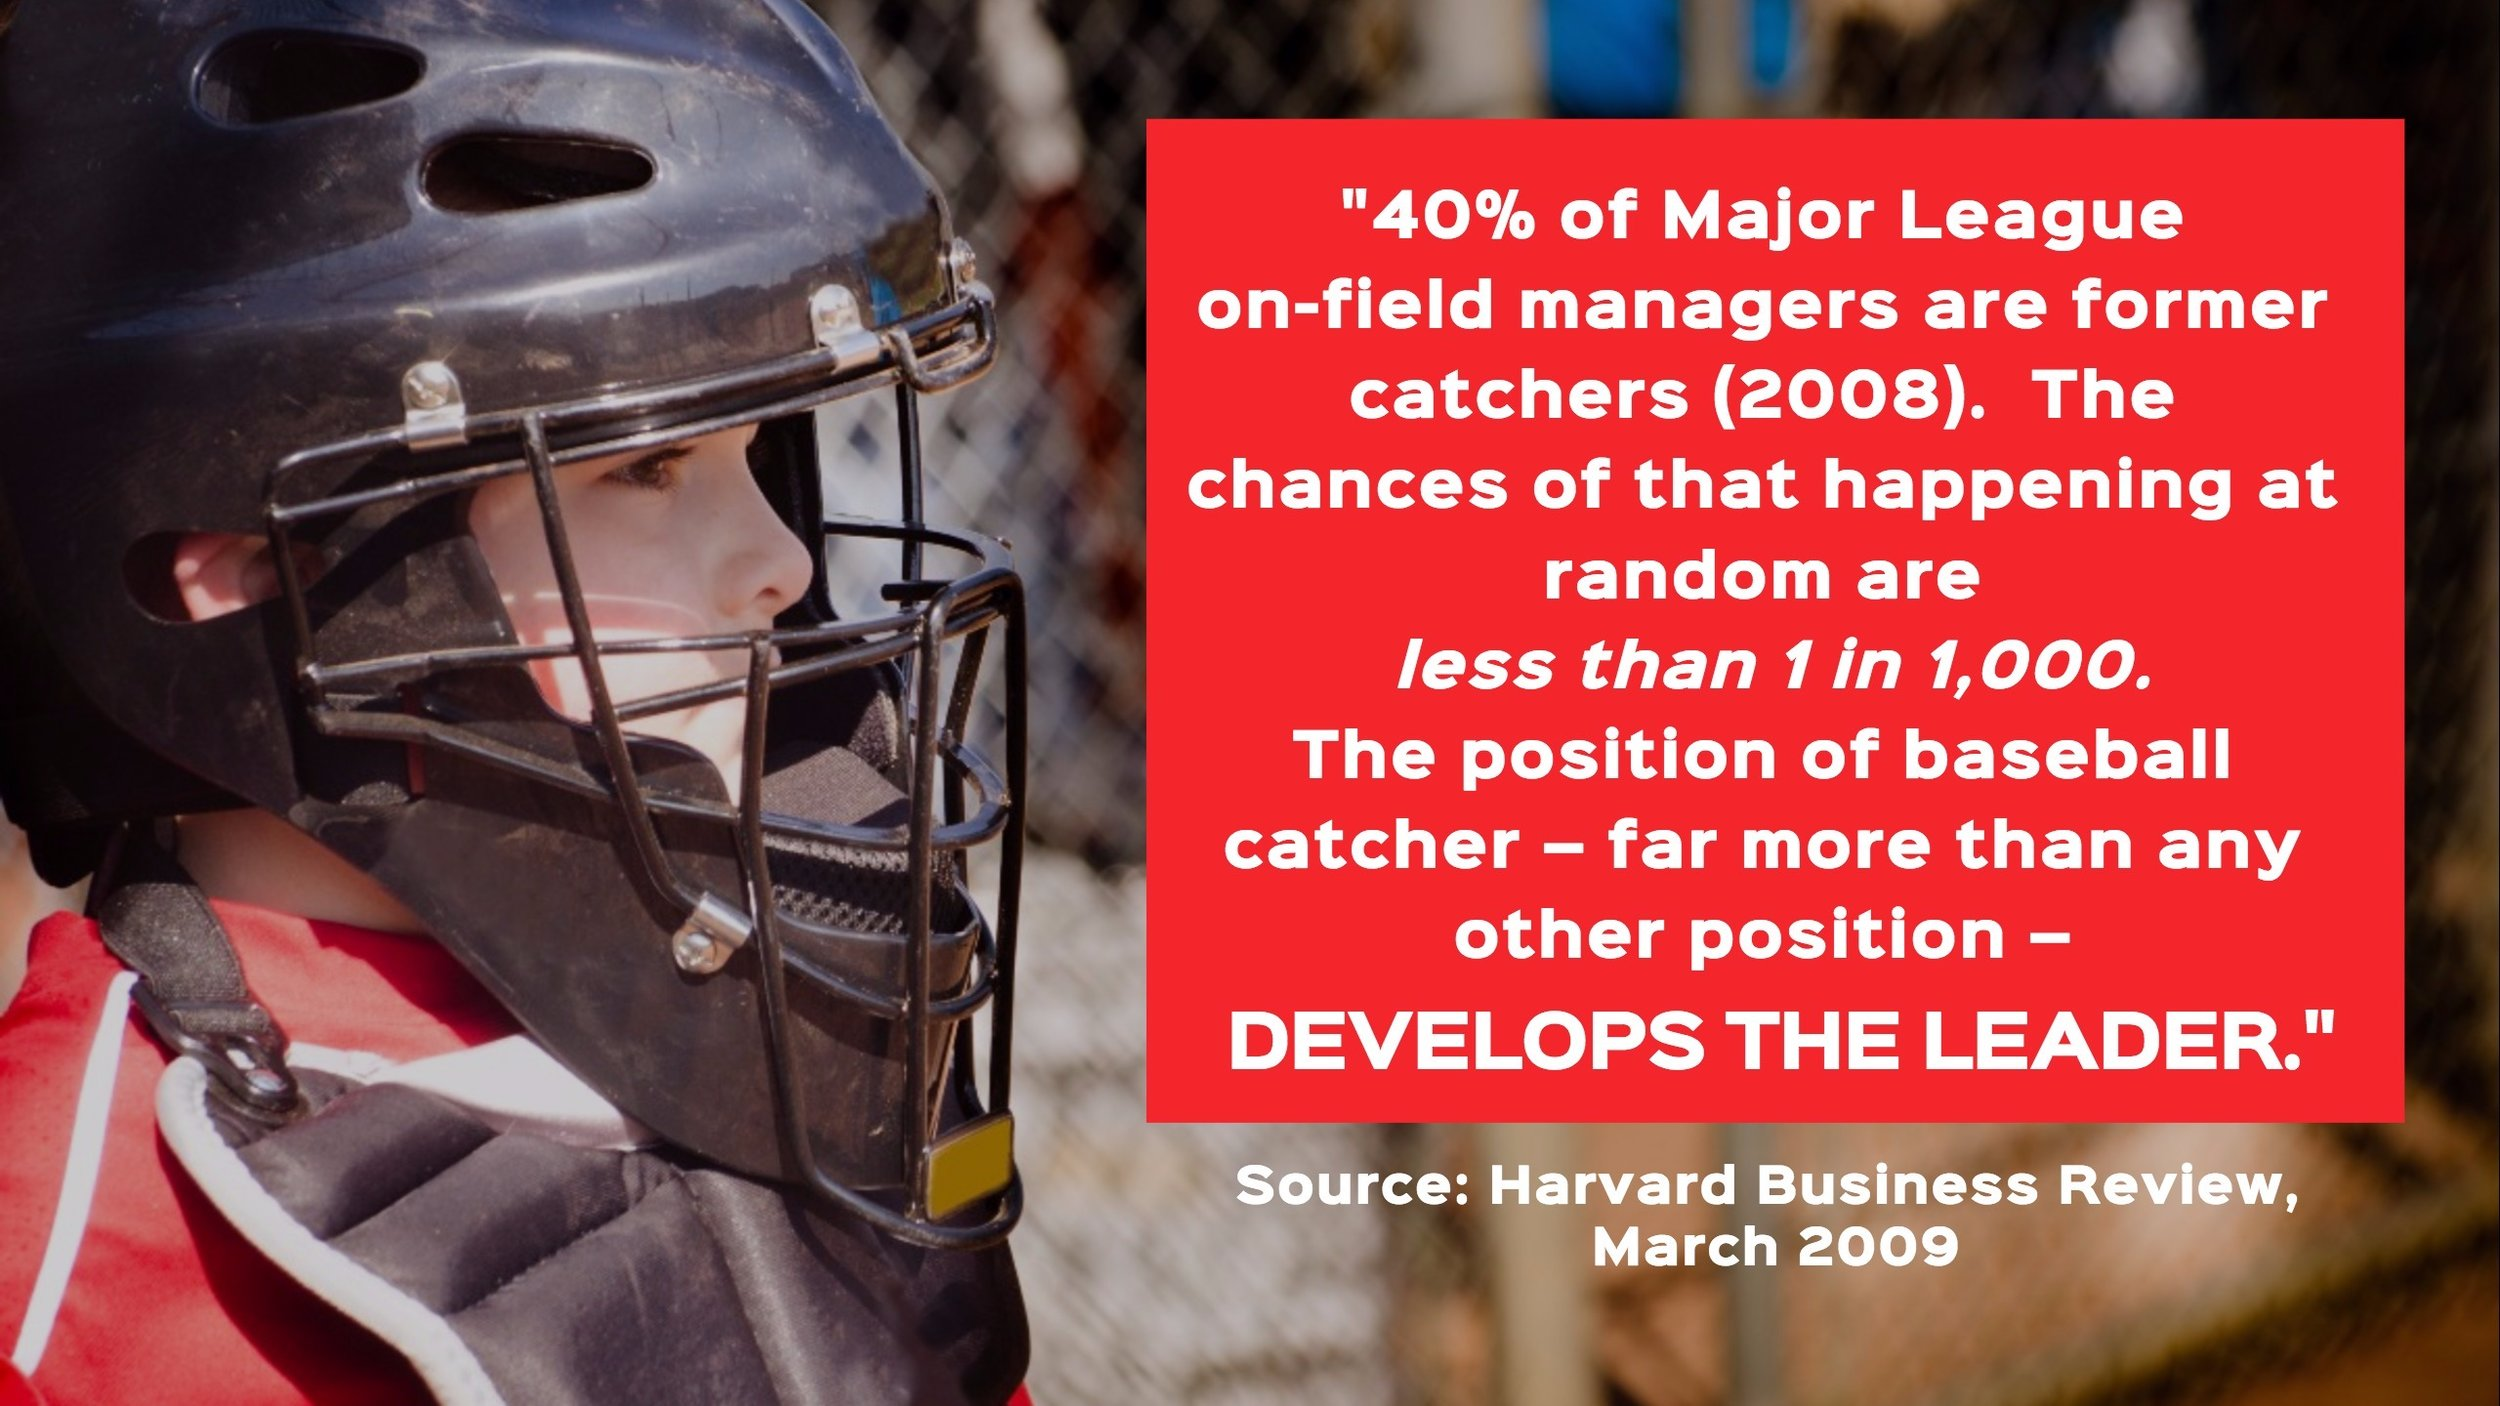 Catcher-leadership-development-1.jpg